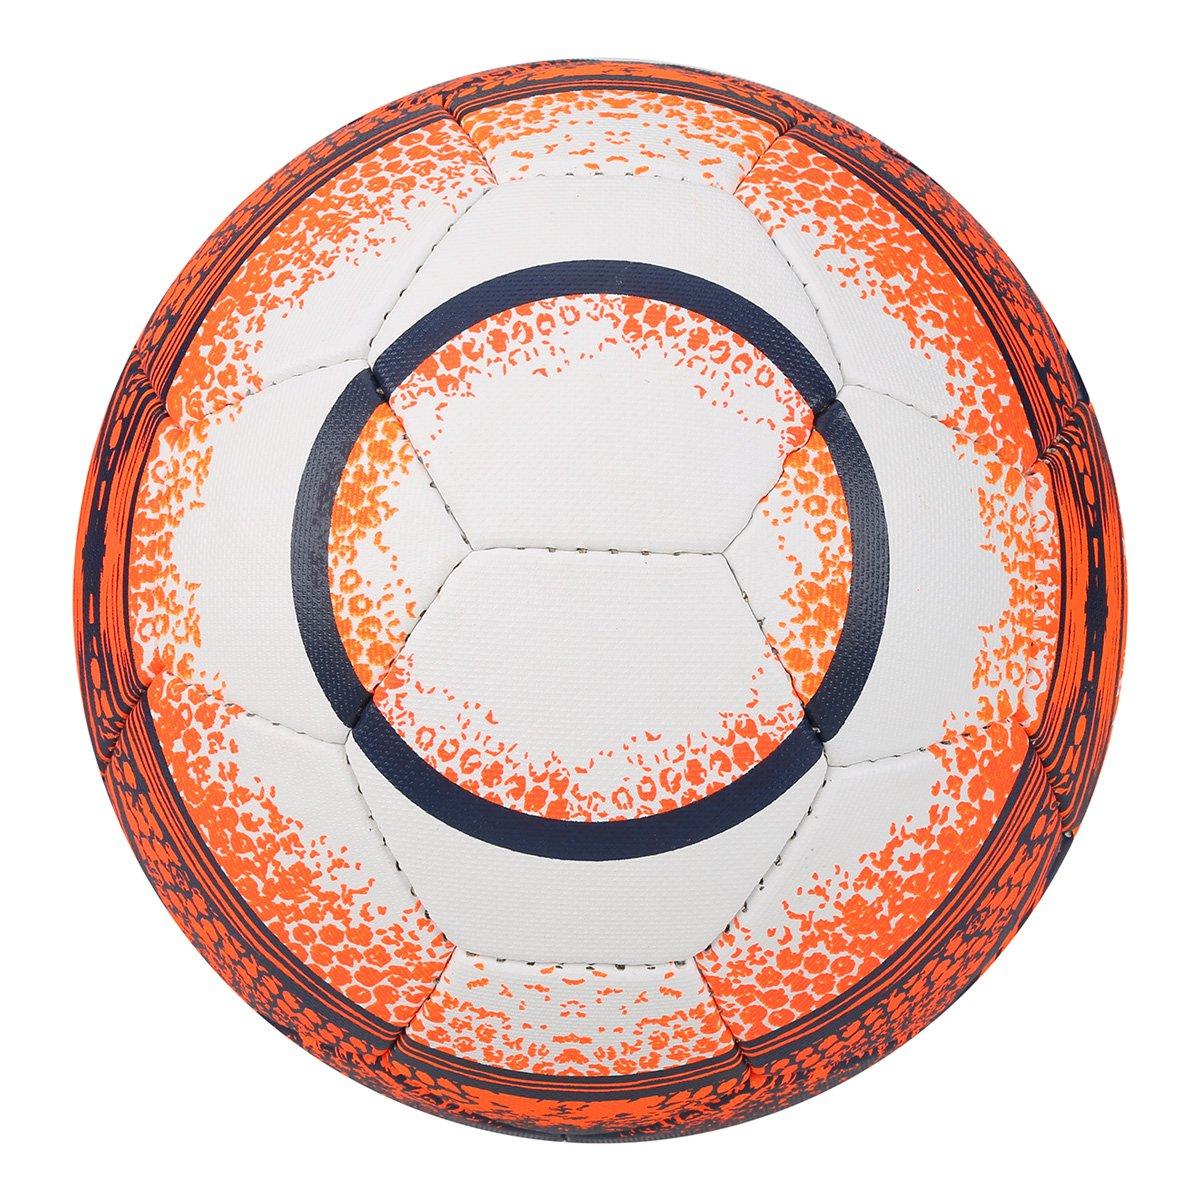 ec3f4e65f2 Bola Futebol Society Penalty S11 R4 VIII - Compre Agora